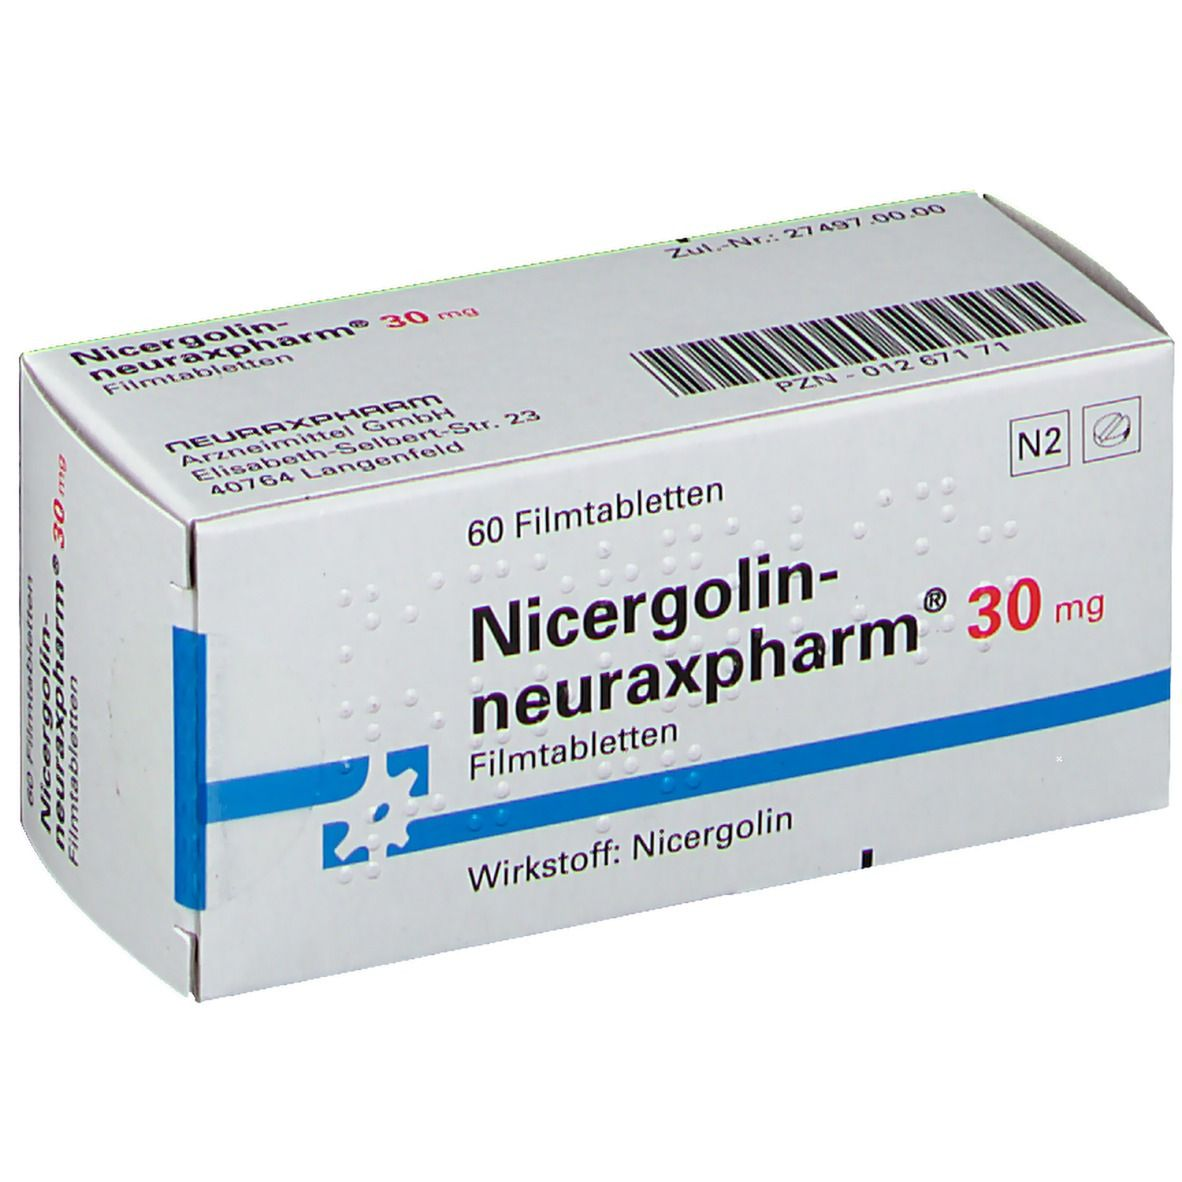 Nicergolin neuraxpharm 30 Filmtabl.